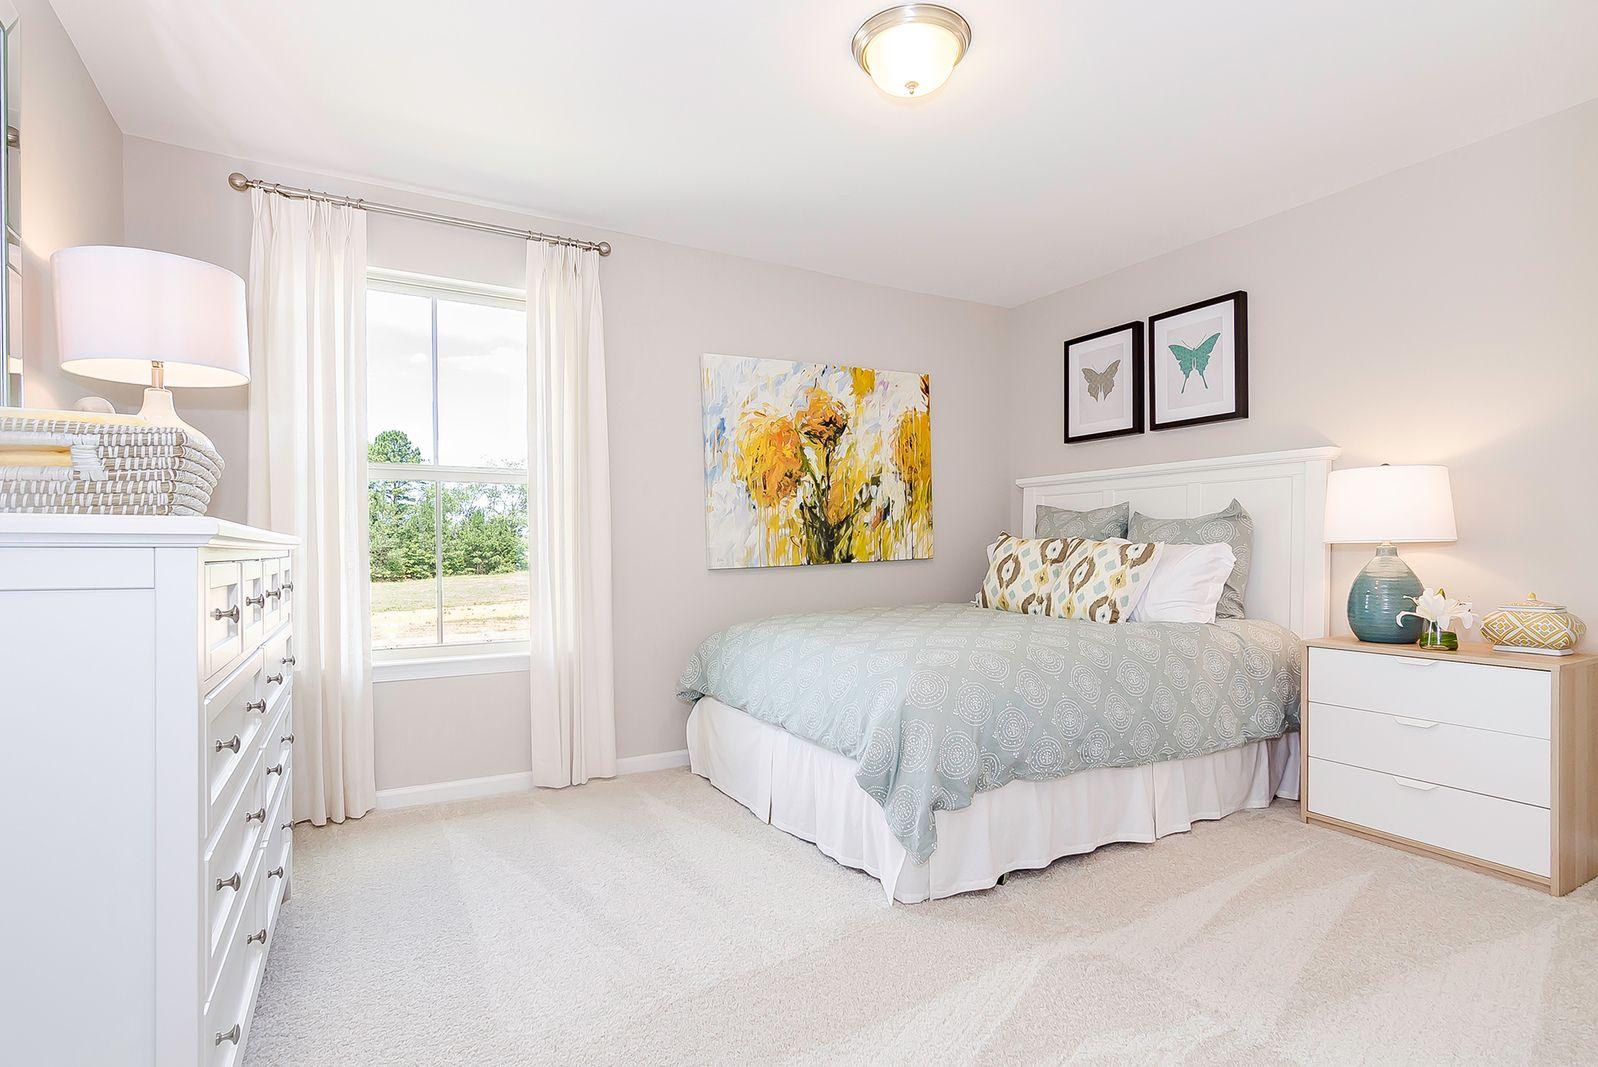 Bedroom featured in the Genoa By HeartlandHomes in Morgantown, WV